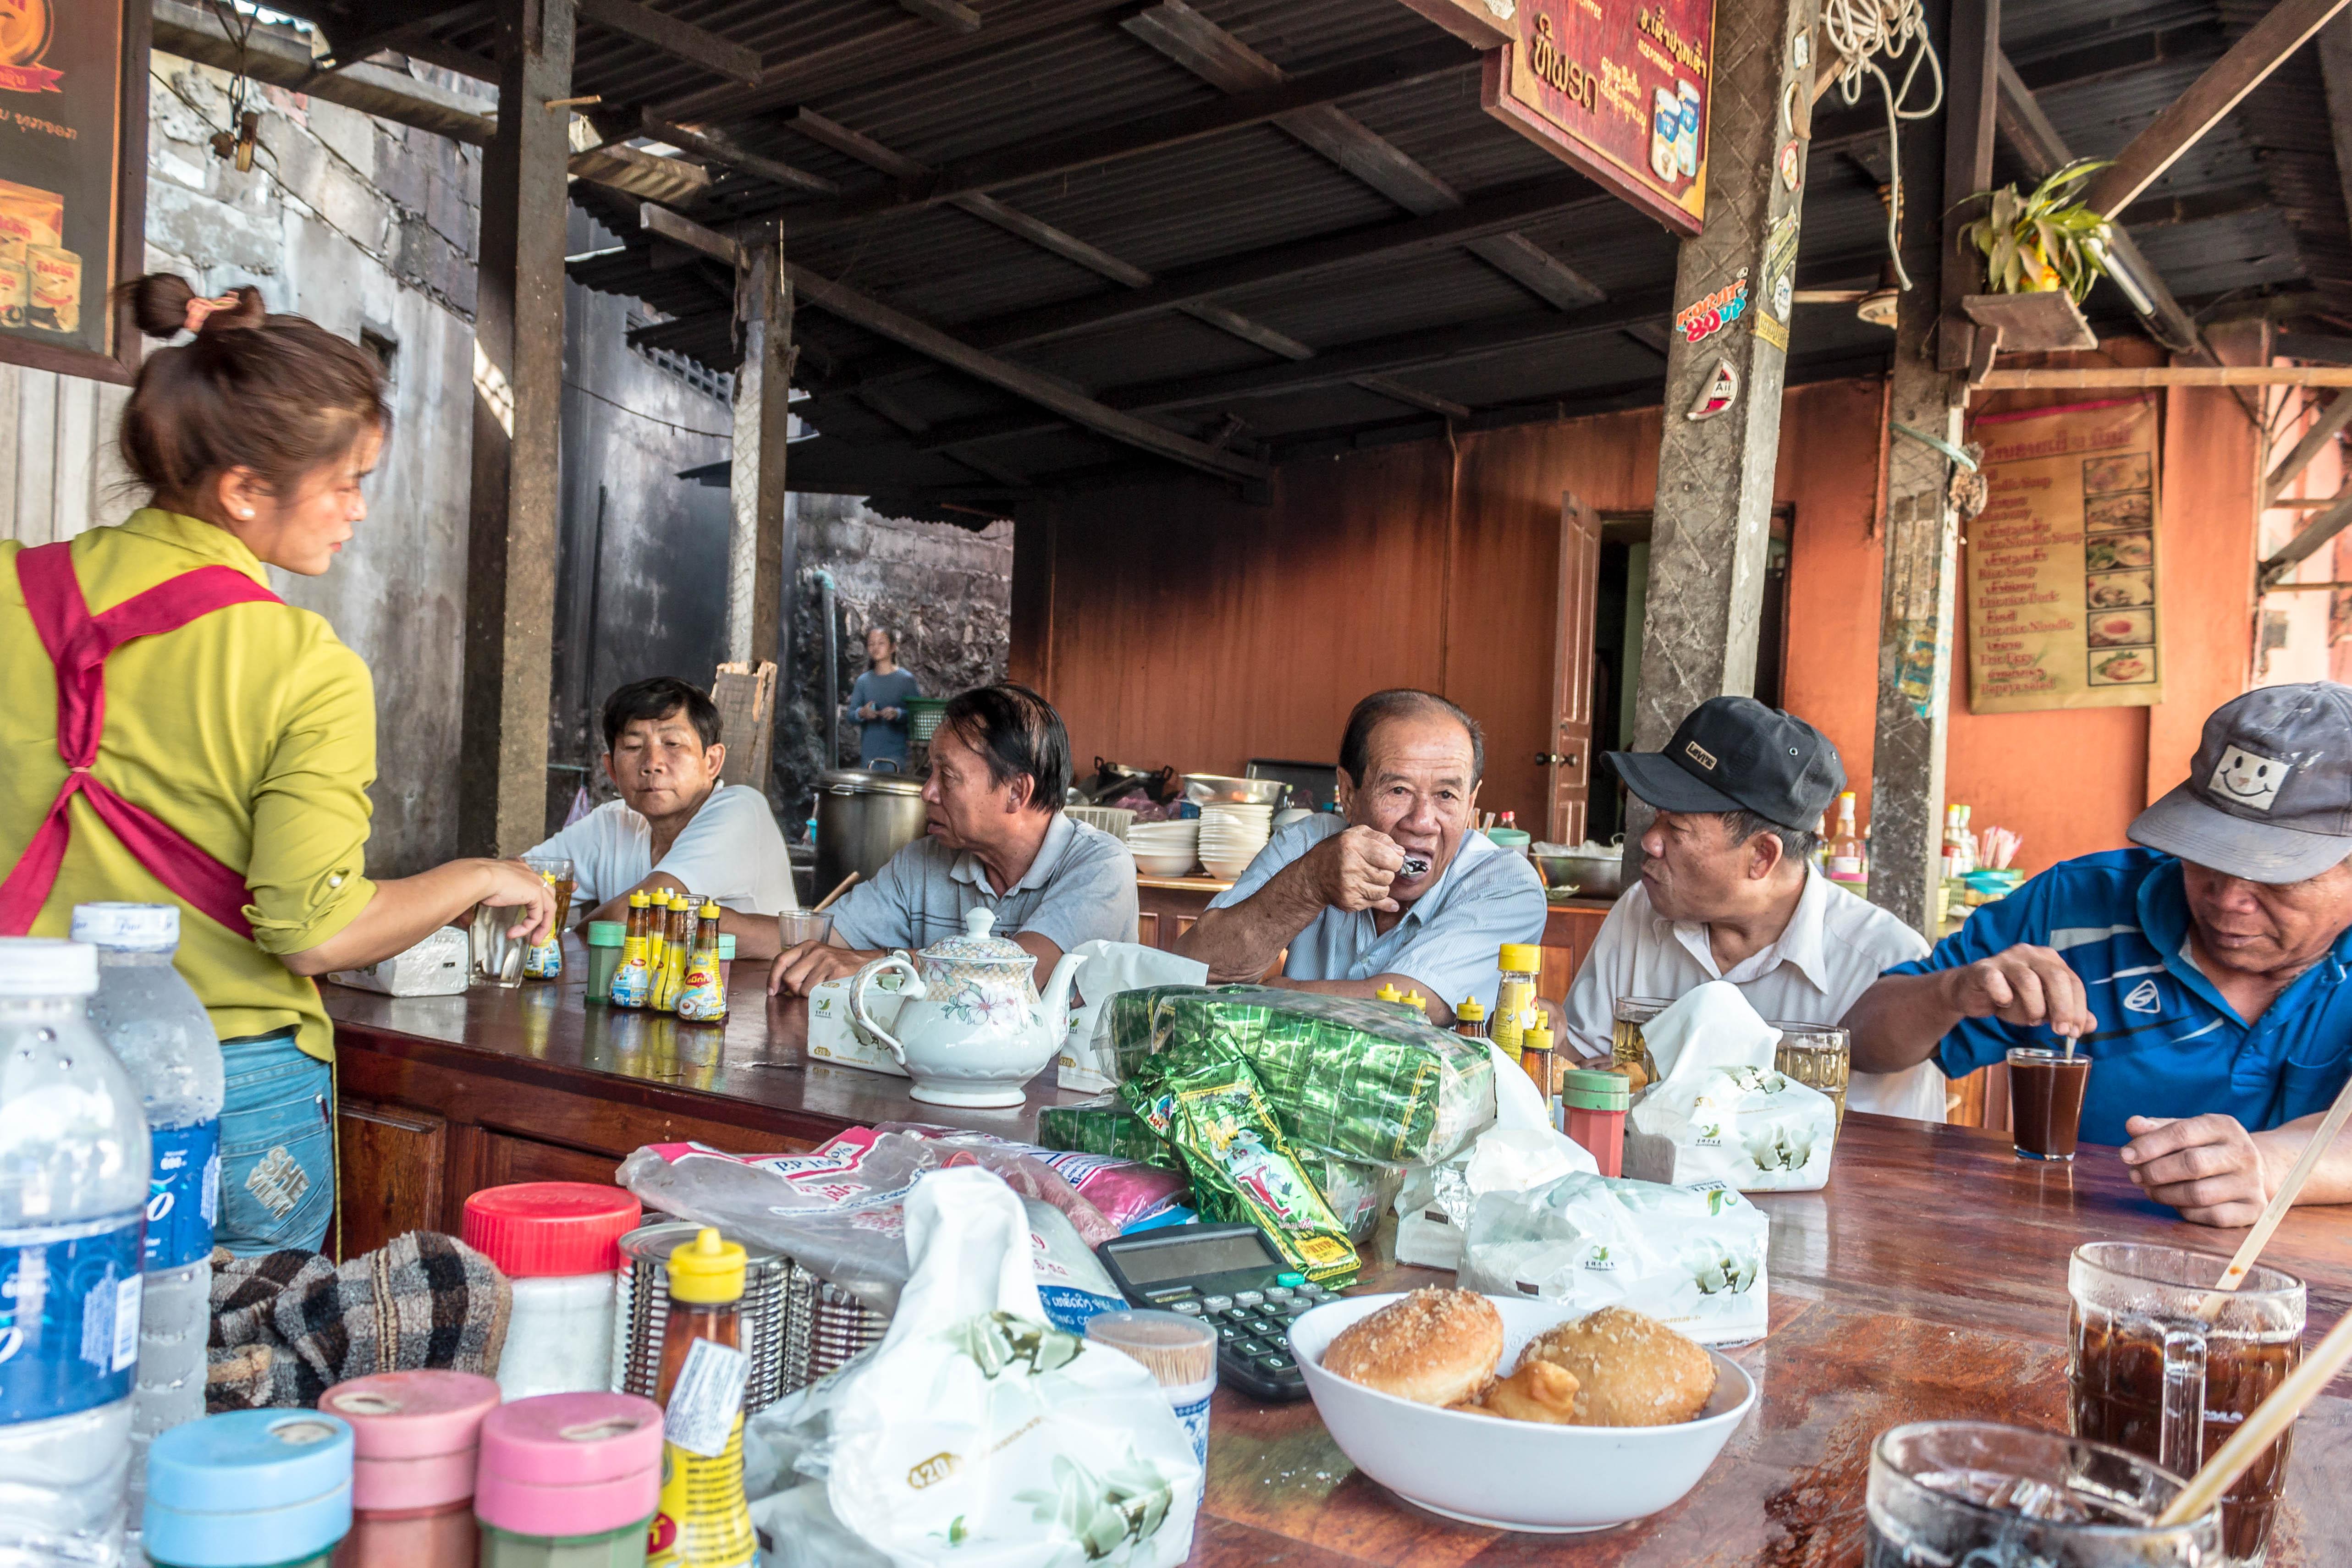 A local cafe with a local gathering. Photo: Tara Tadlock